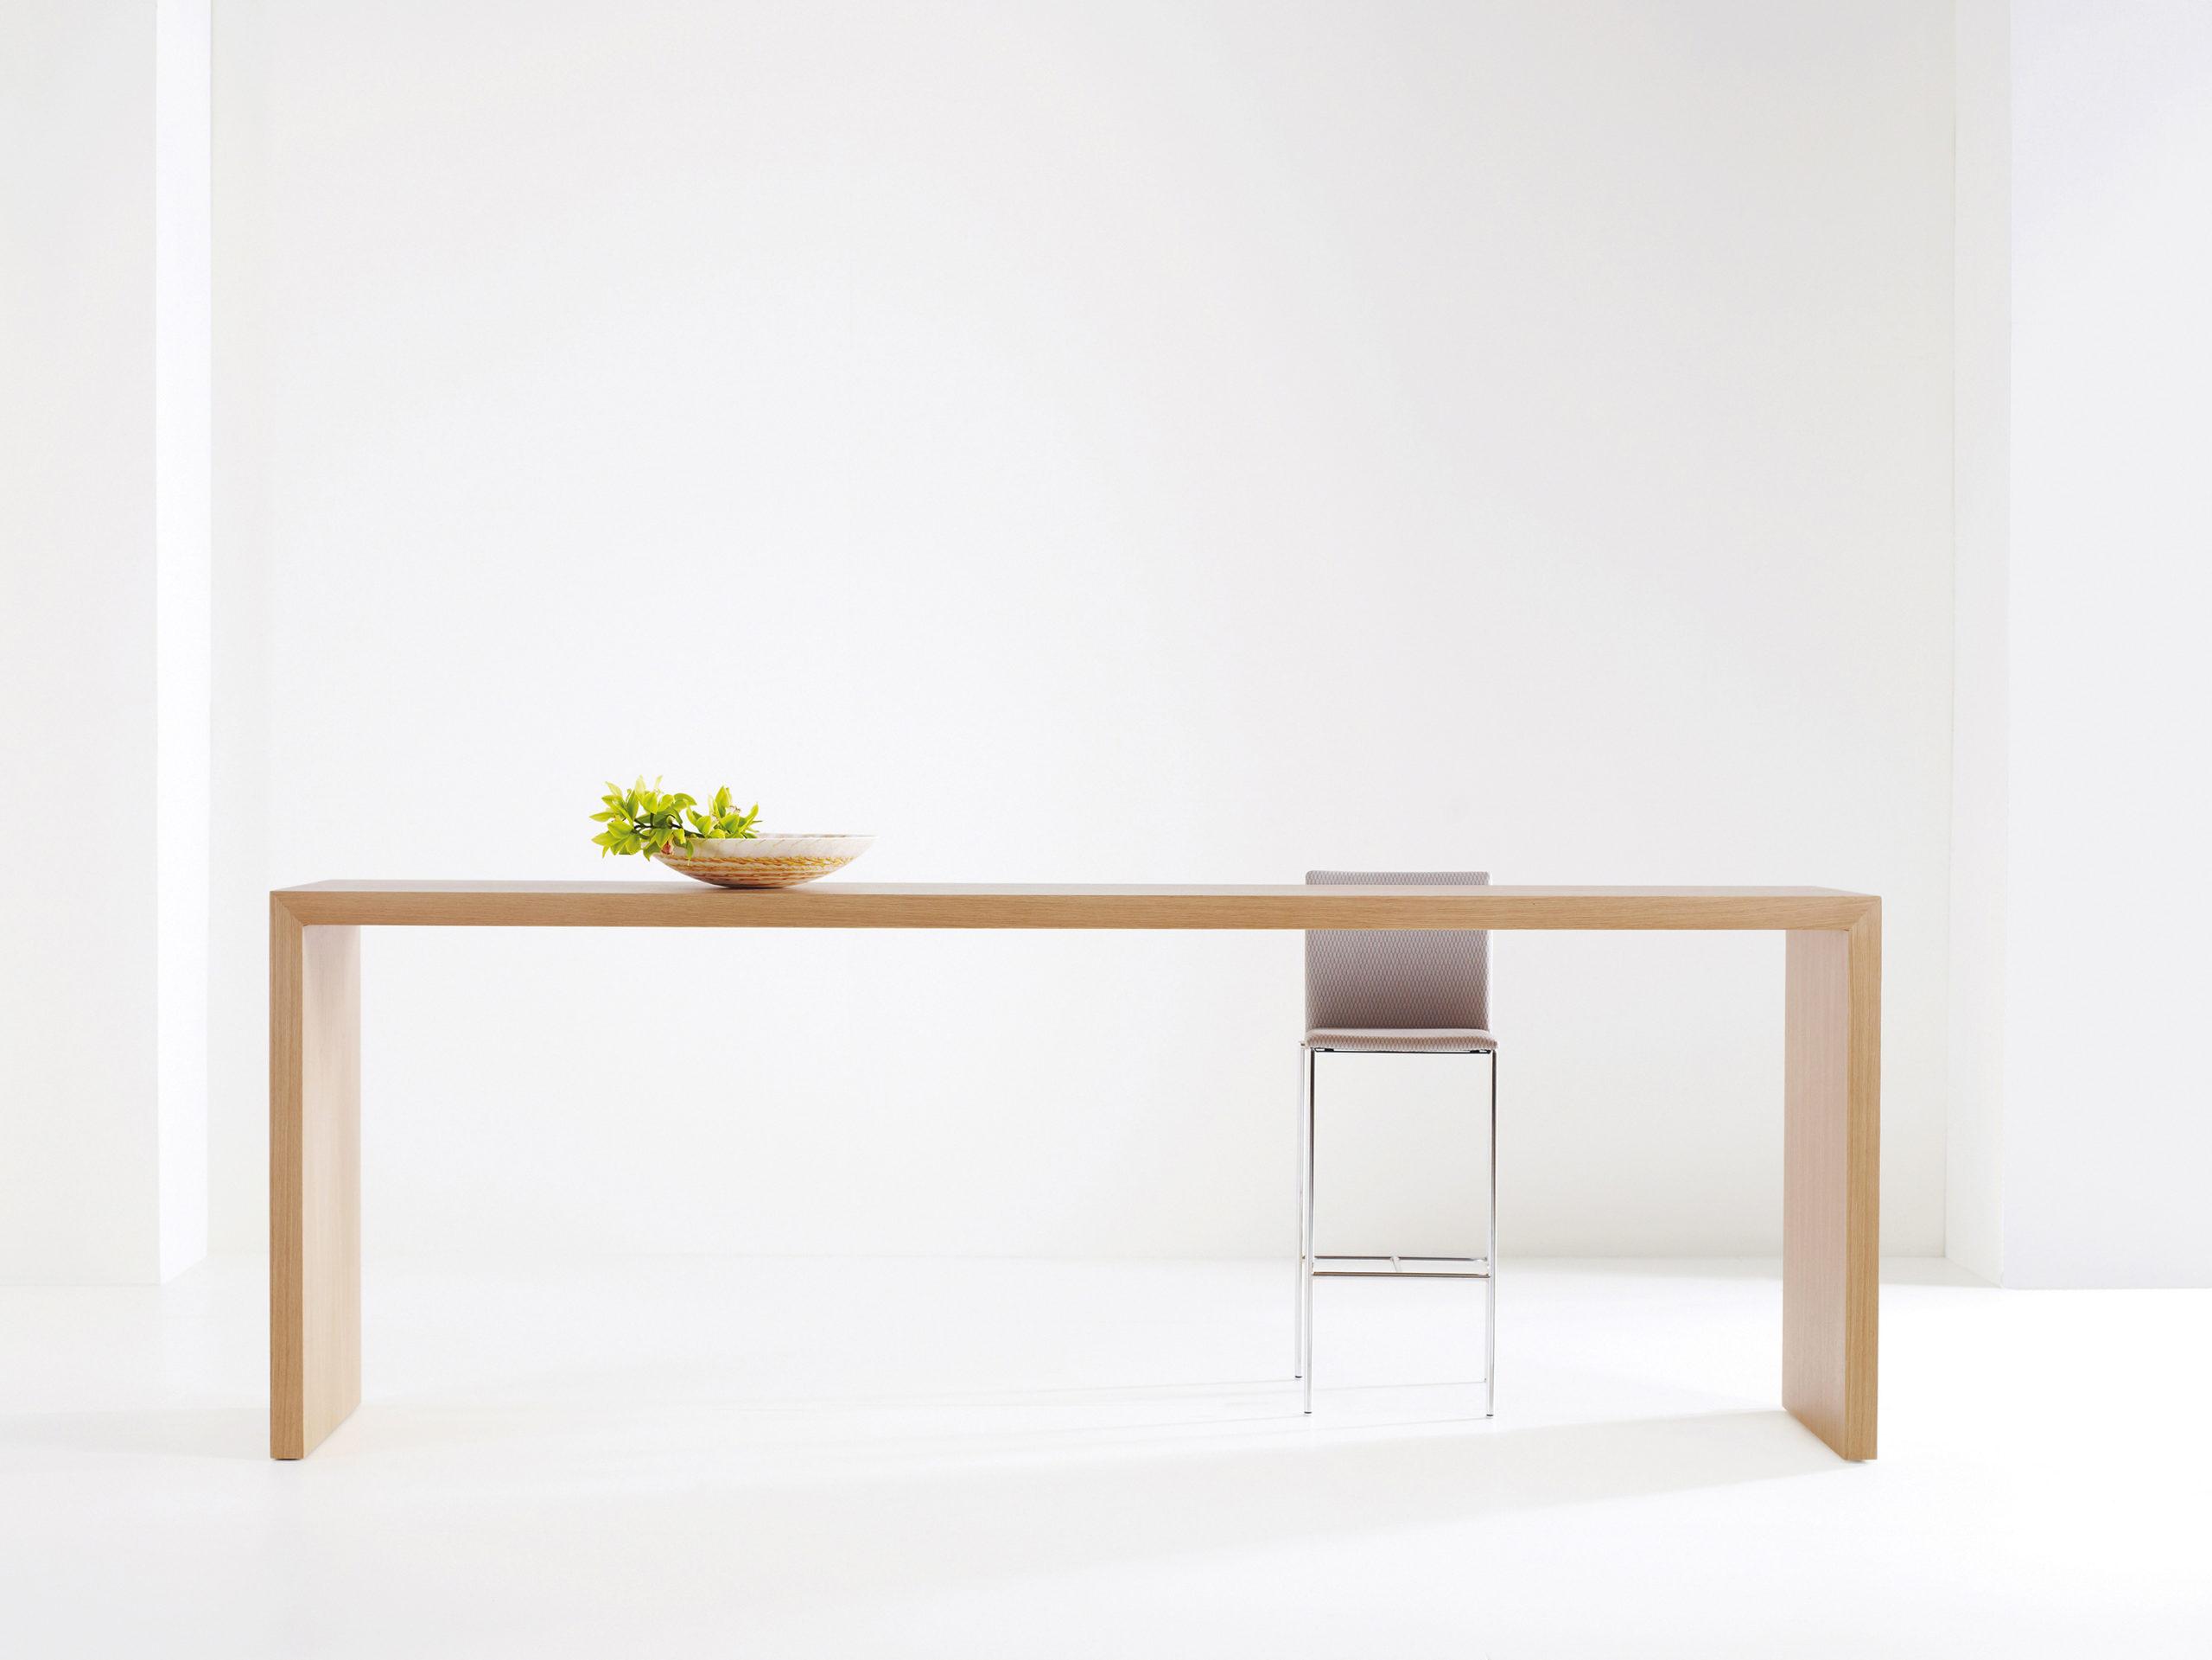 Davis Image 12_Prat Table with Props